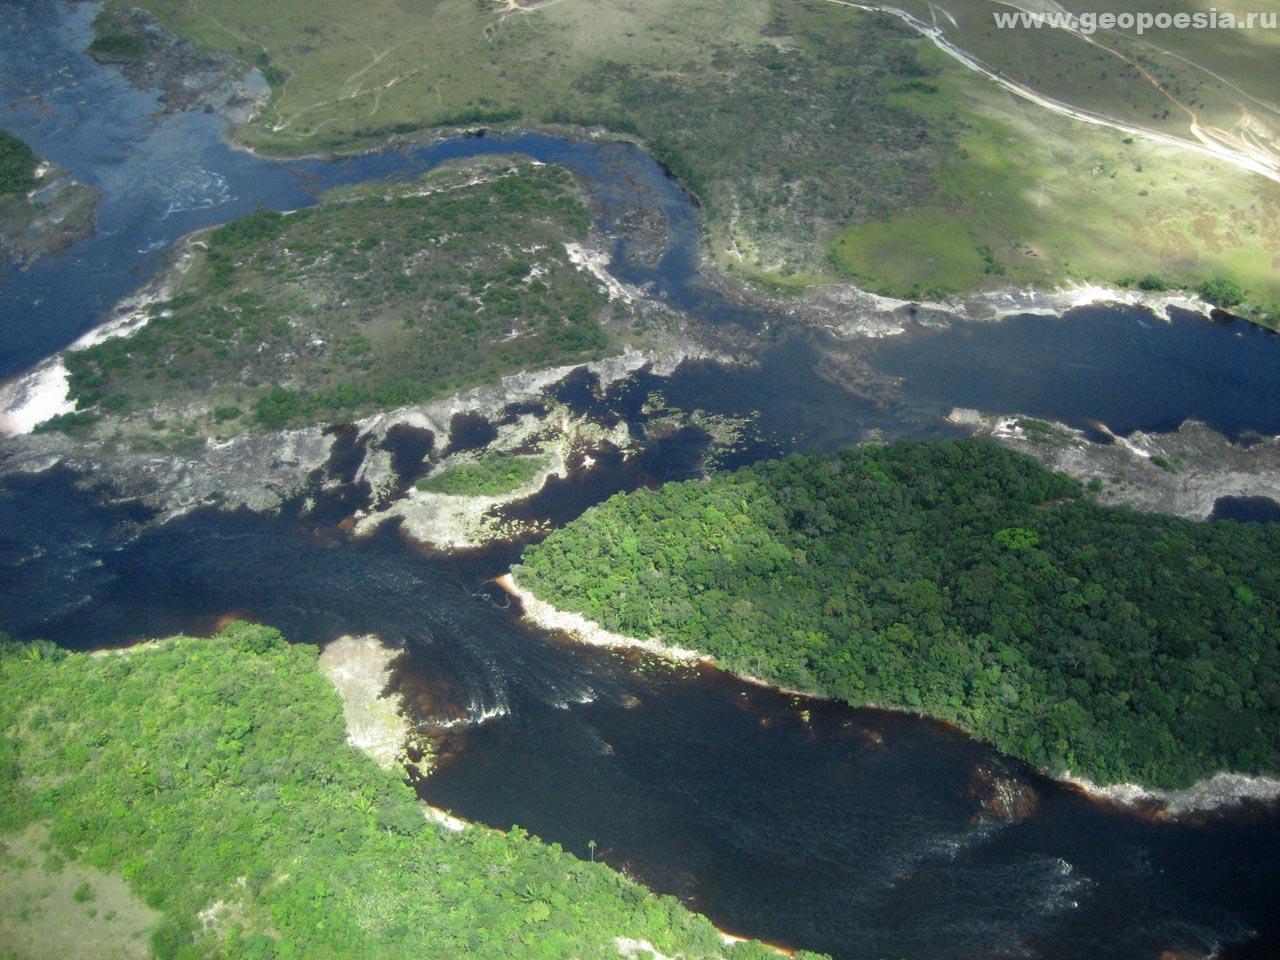 http://www.geopoesia.ru/gp/foto/venezuela/venezuela-foto-223.jpg